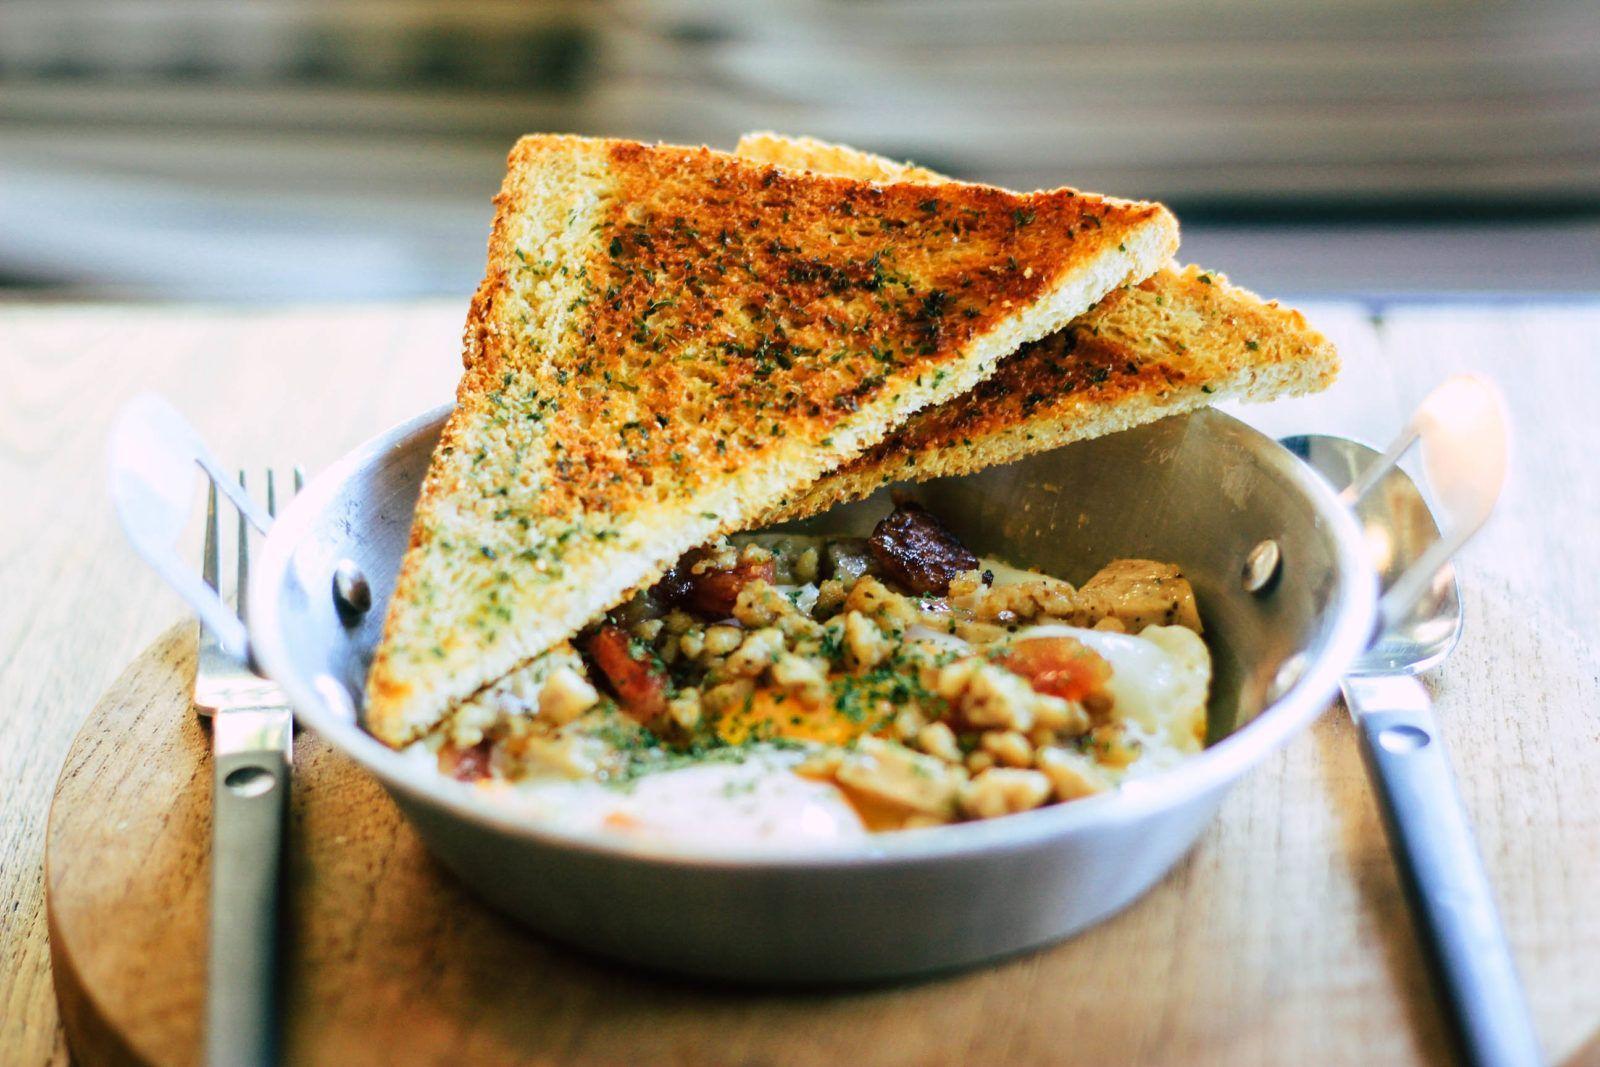 Dieta Settimanale Vegetariana Calorie : Dieta settimanale invernale da calorie diete per dimagrire